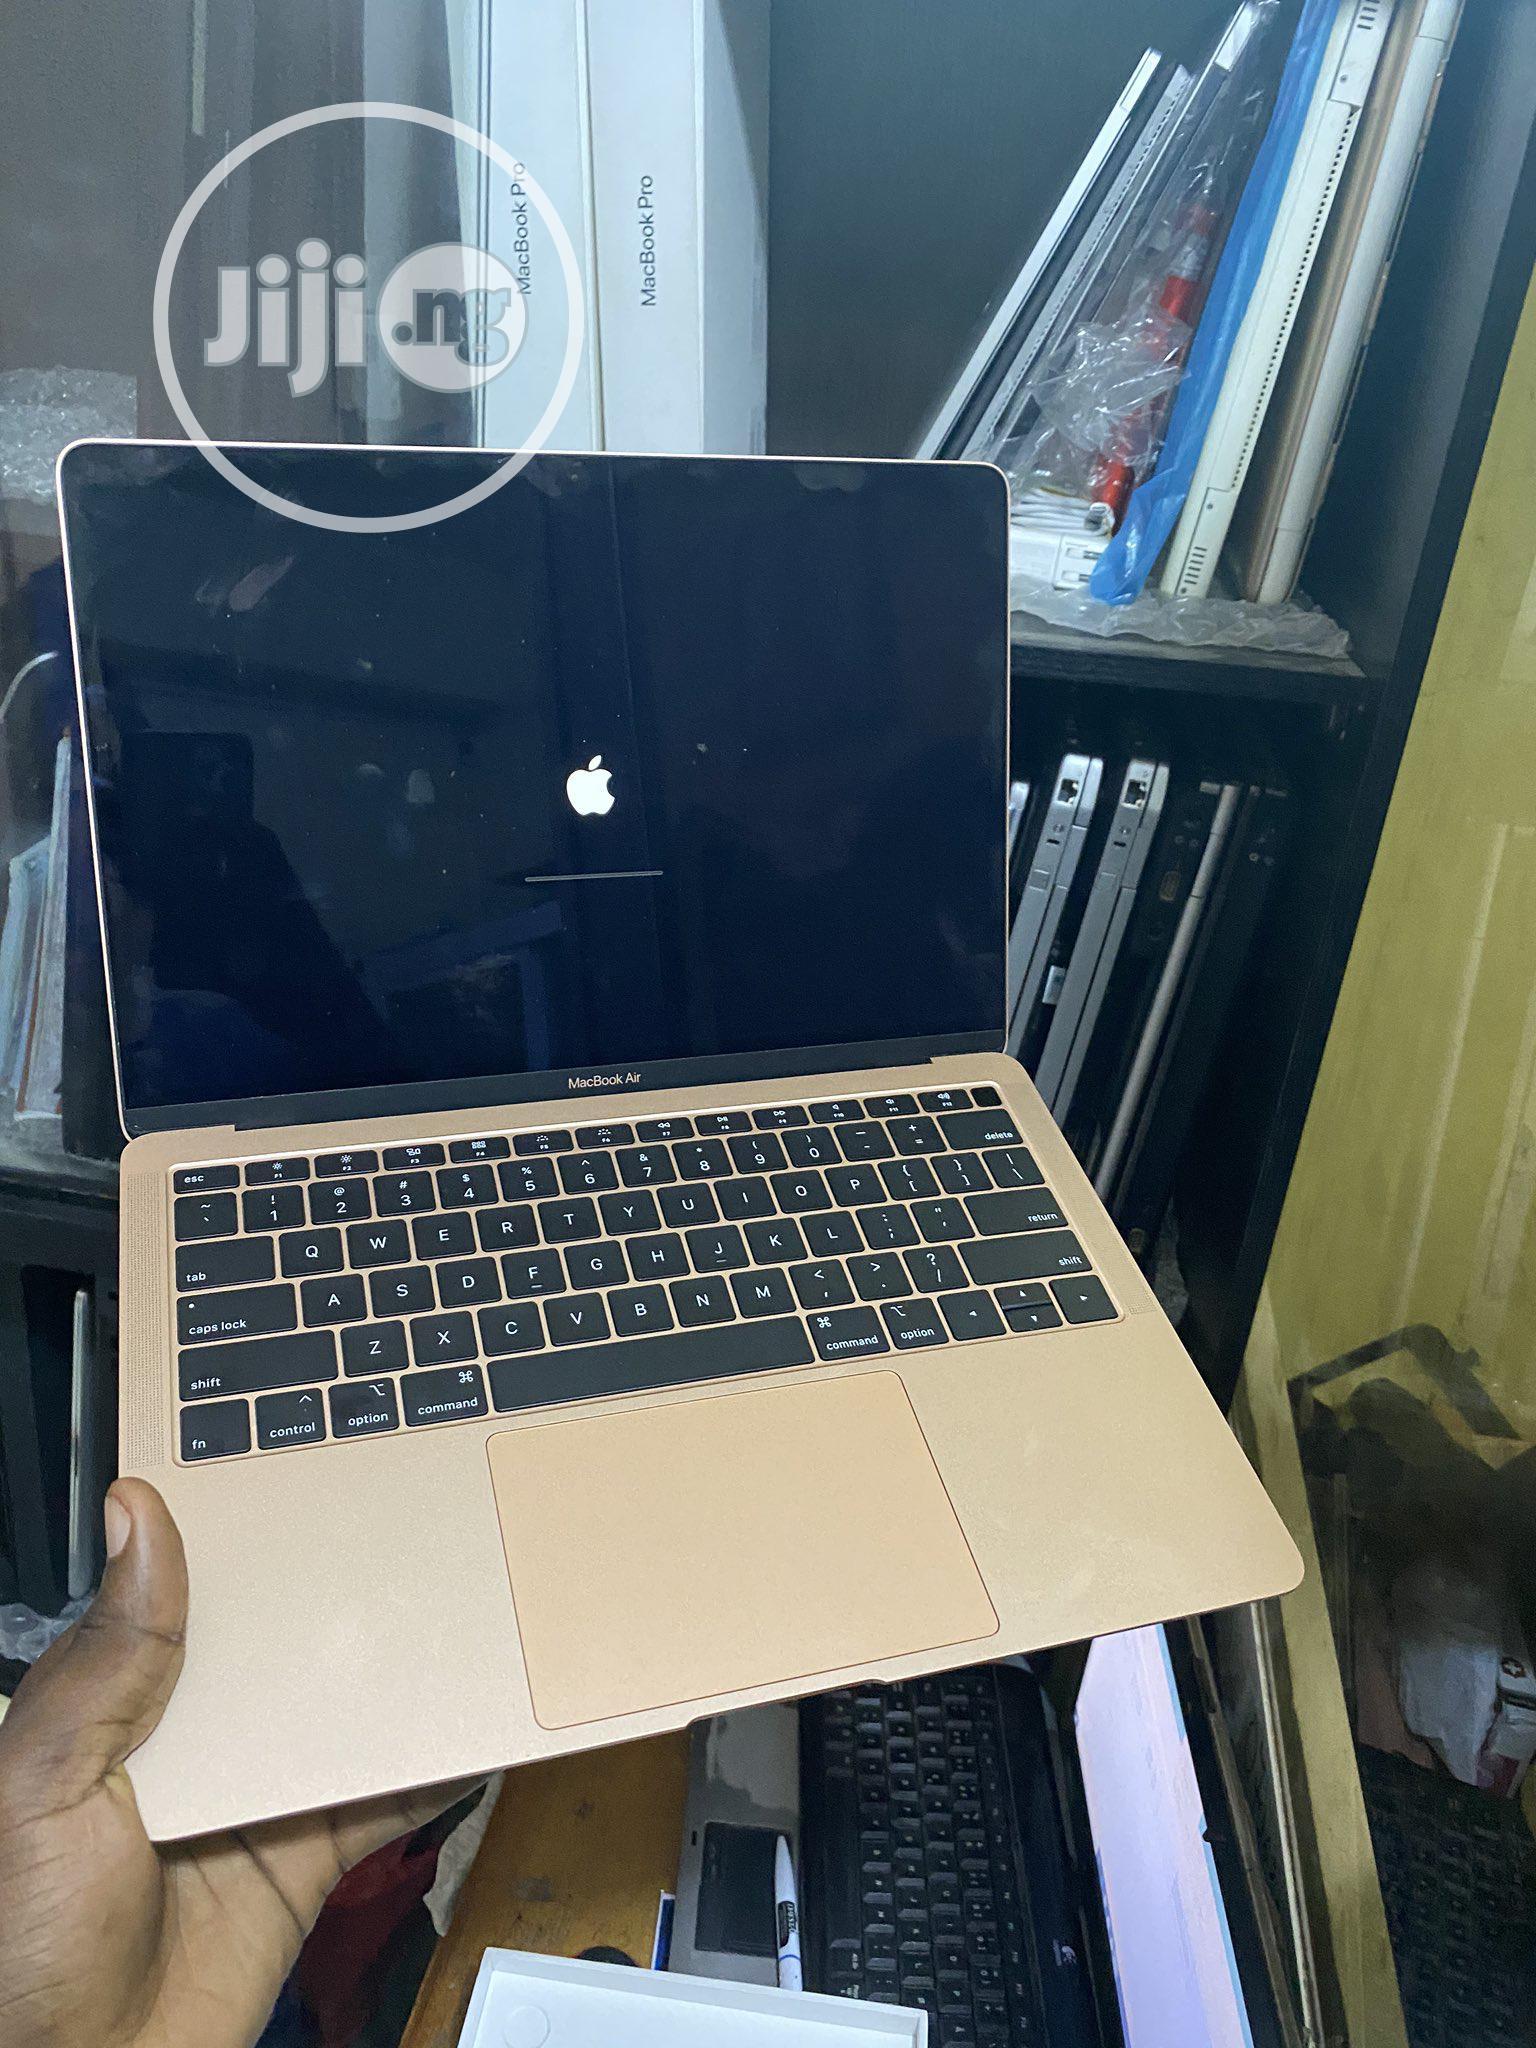 Laptop Apple MacBook Air 8GB Intel Core I5 SSD 256GB   Laptops & Computers for sale in Ikeja, Lagos State, Nigeria